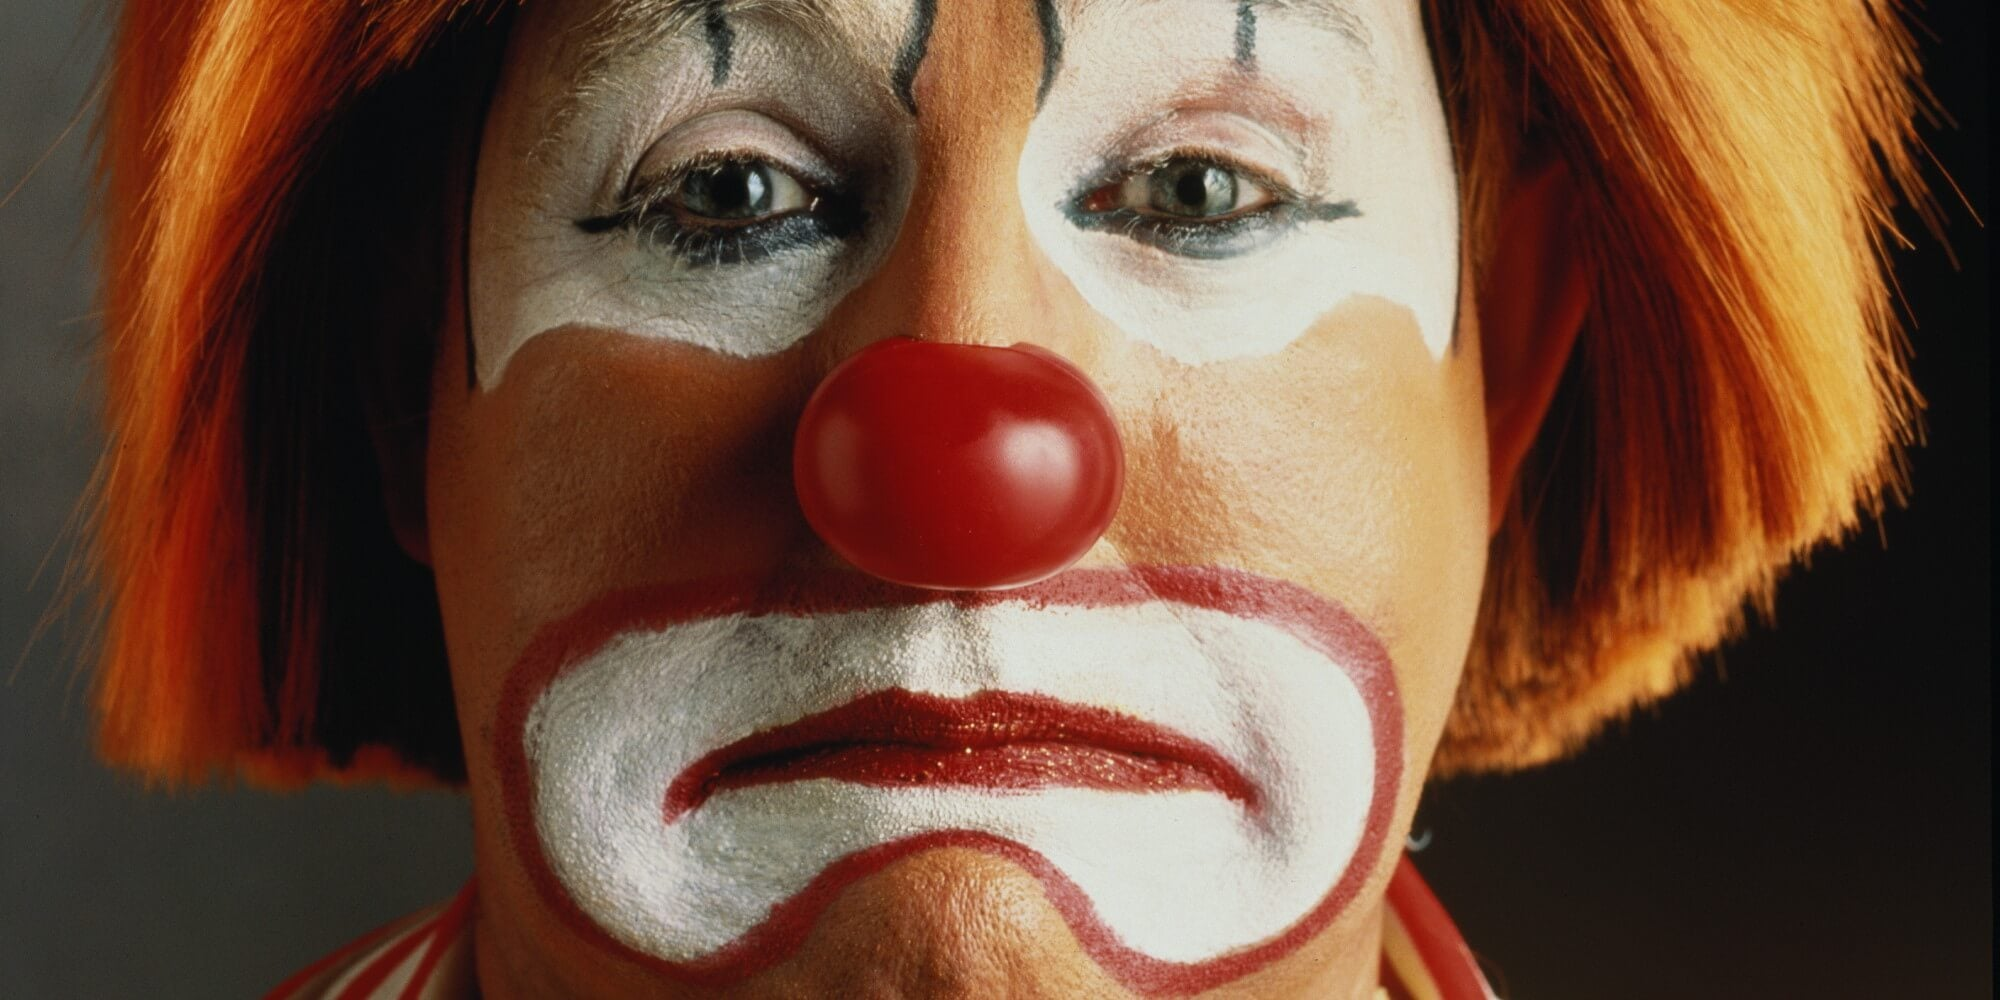 happy clown faces pictures - HD2000×1000